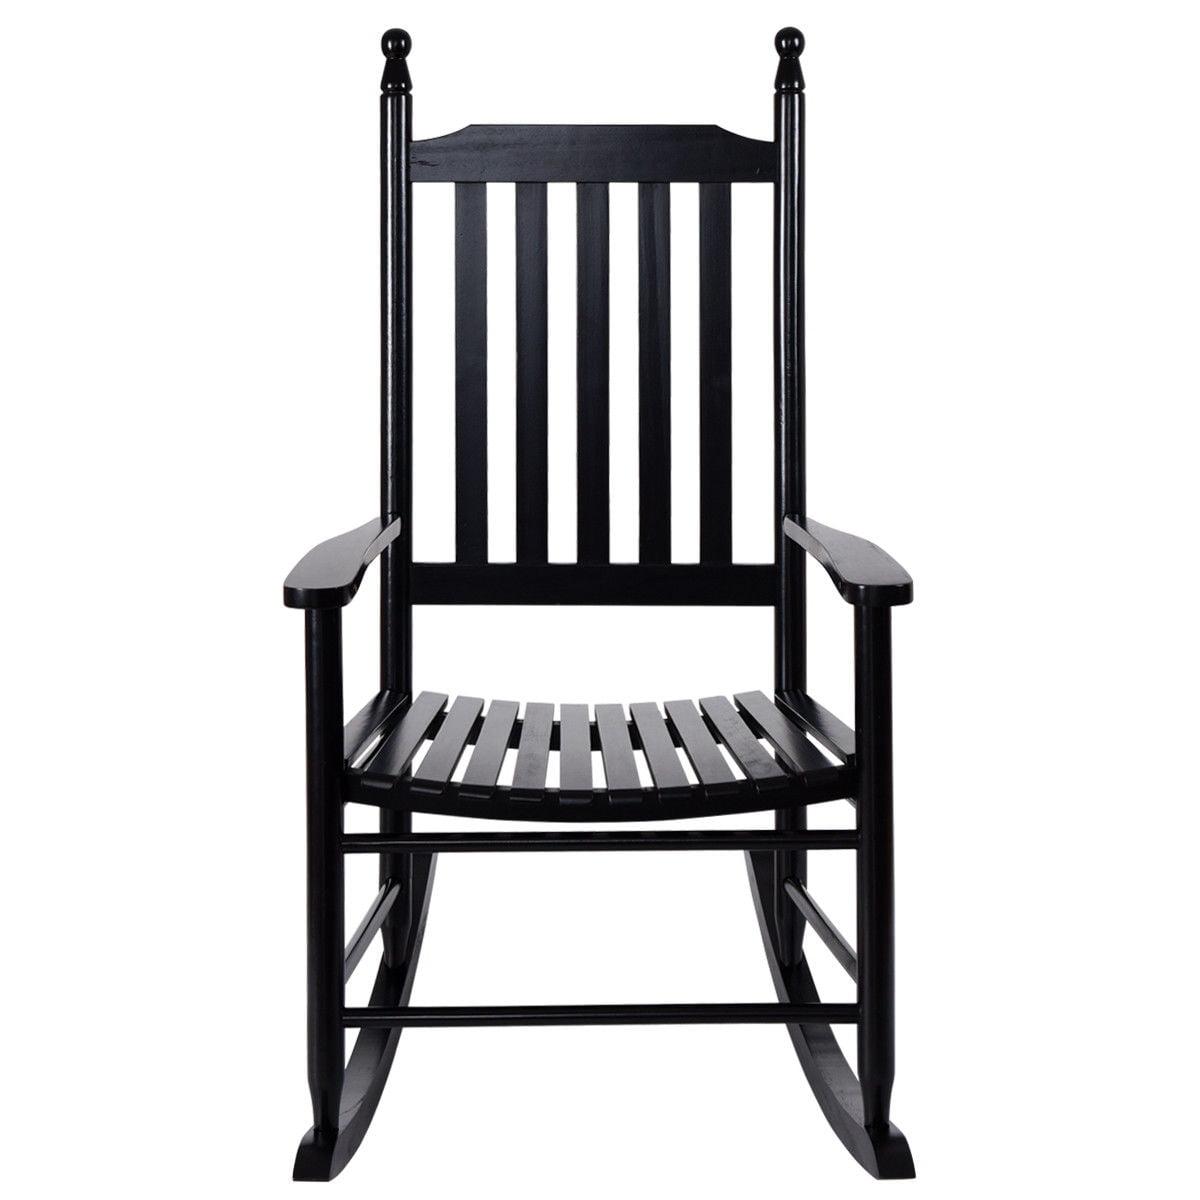 Gymax Wooden Rocking Chair Porch Rocker Armchair Balcony Deck Garden Furniture Black - image 2 of 8